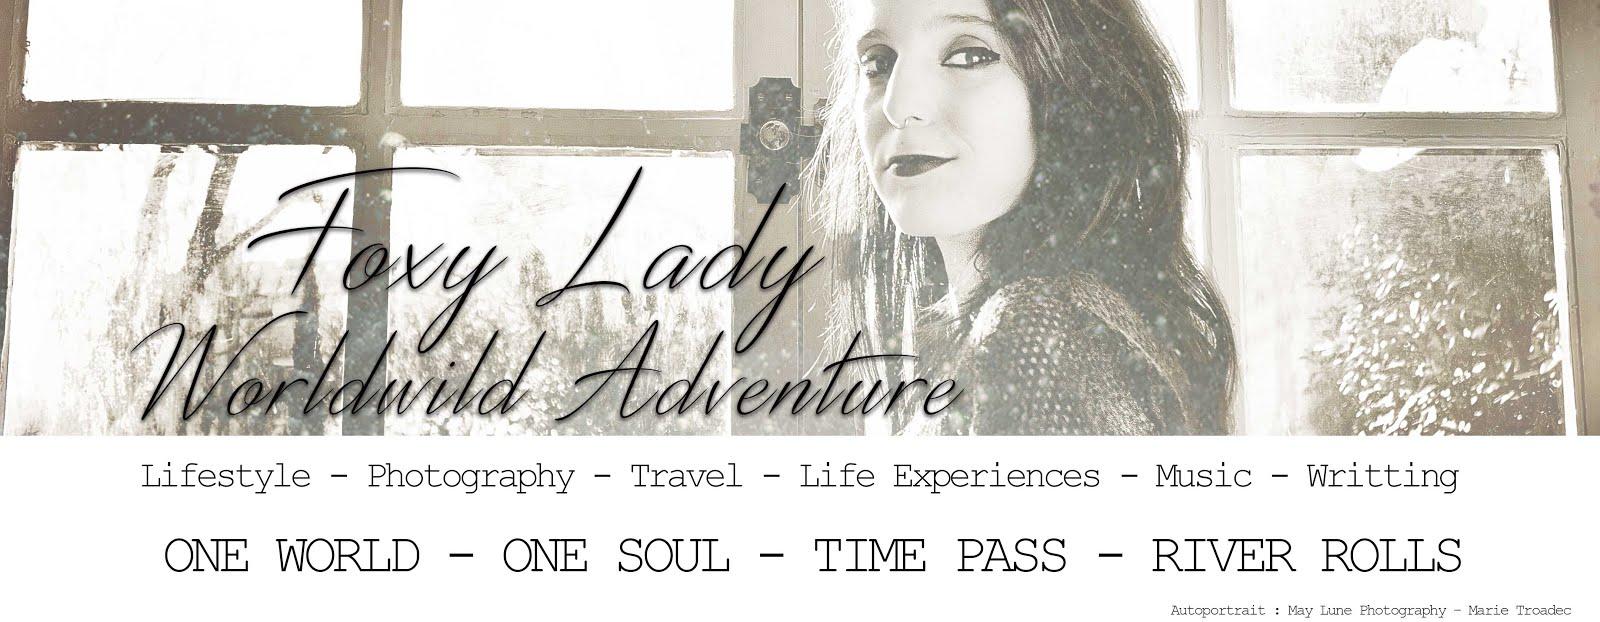 Foxy Lady Worldwild Adventure